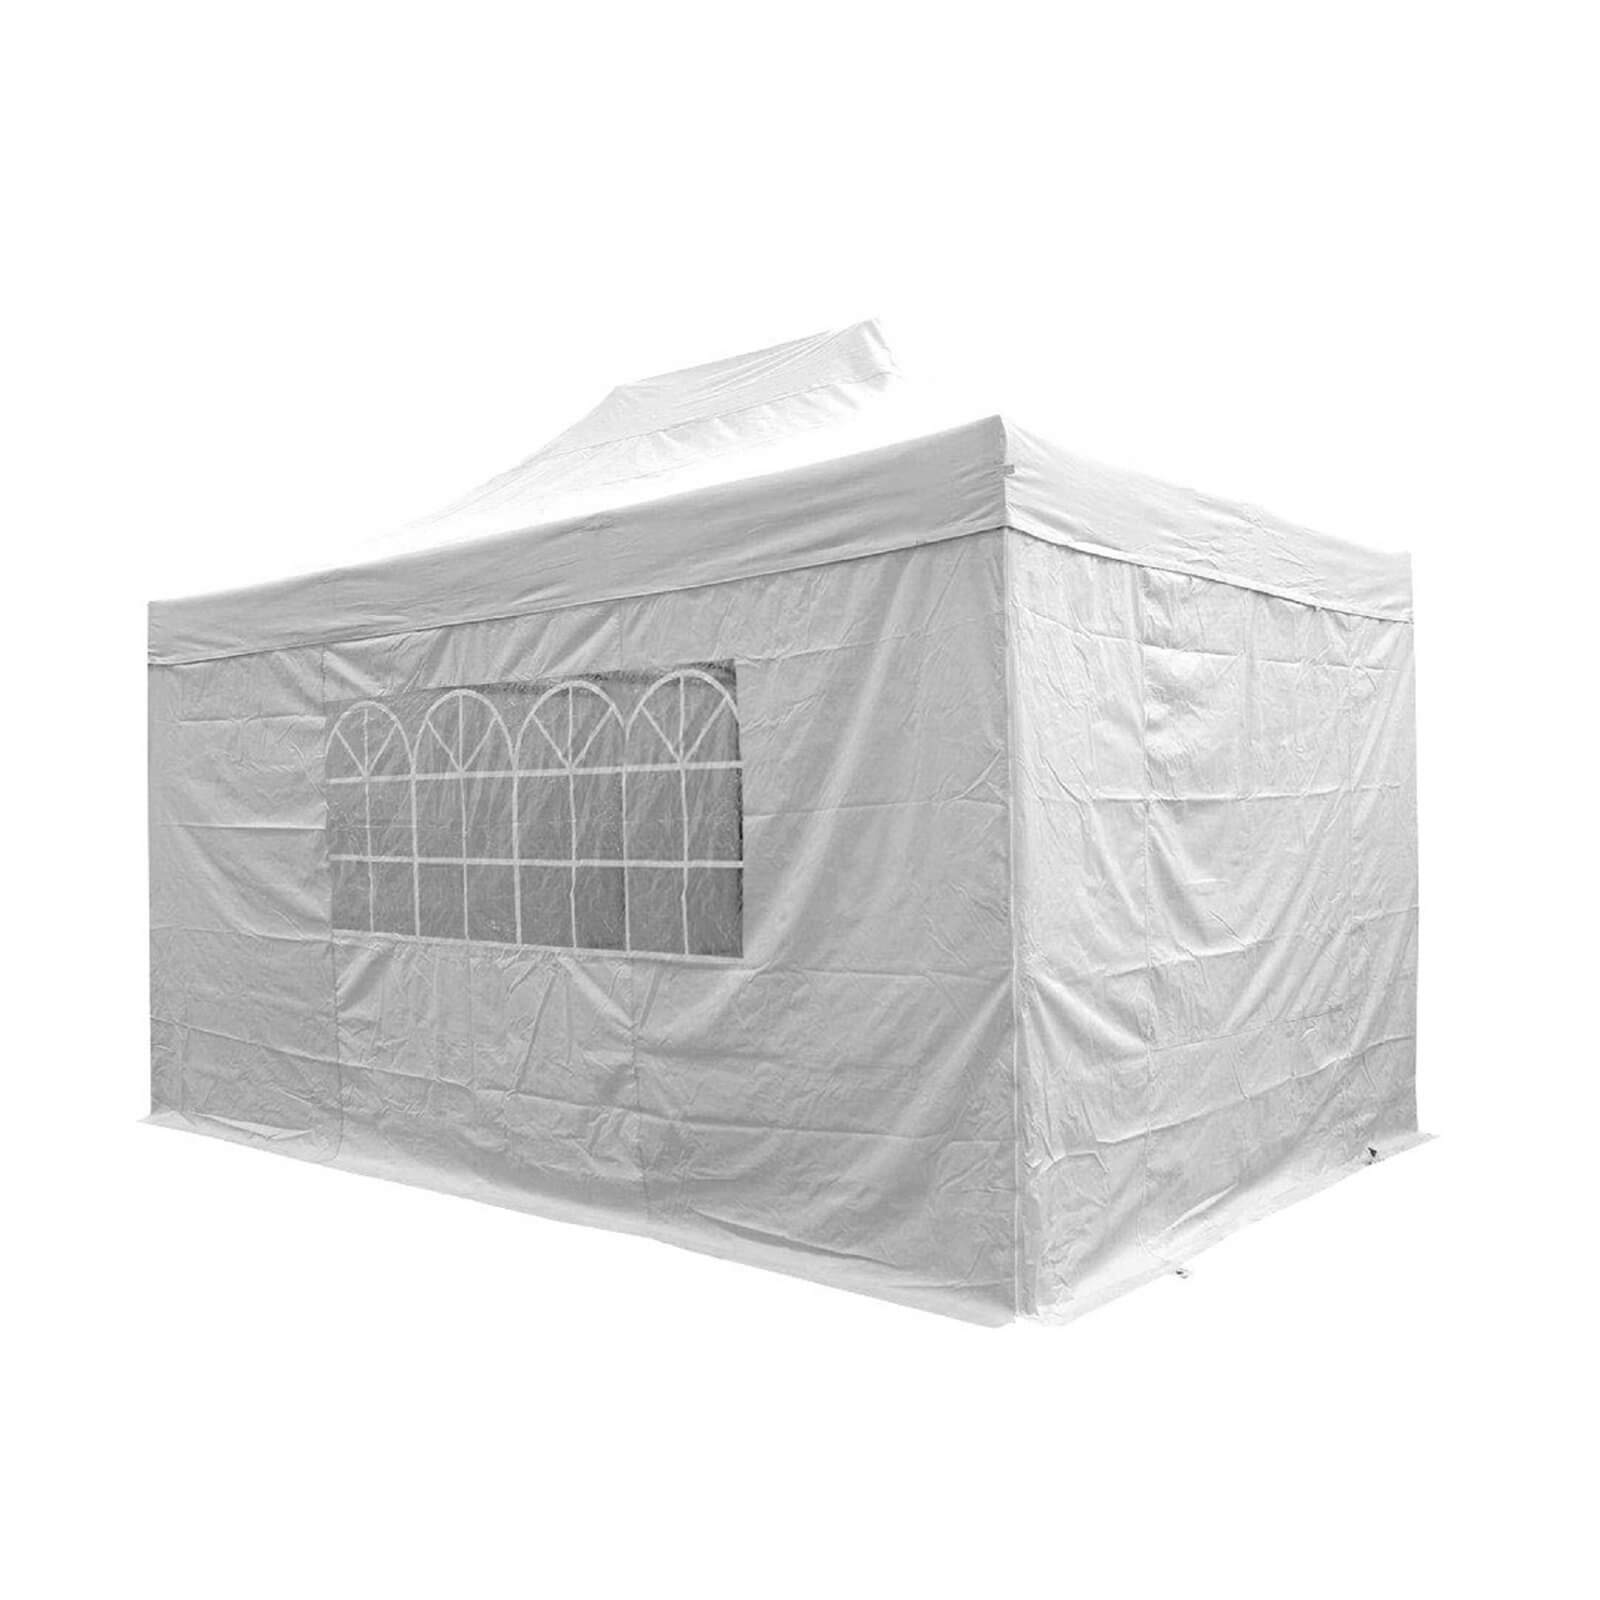 Airwave Four Seasons Essential 3x4.5 Pop Up Gazebo with Sides - White